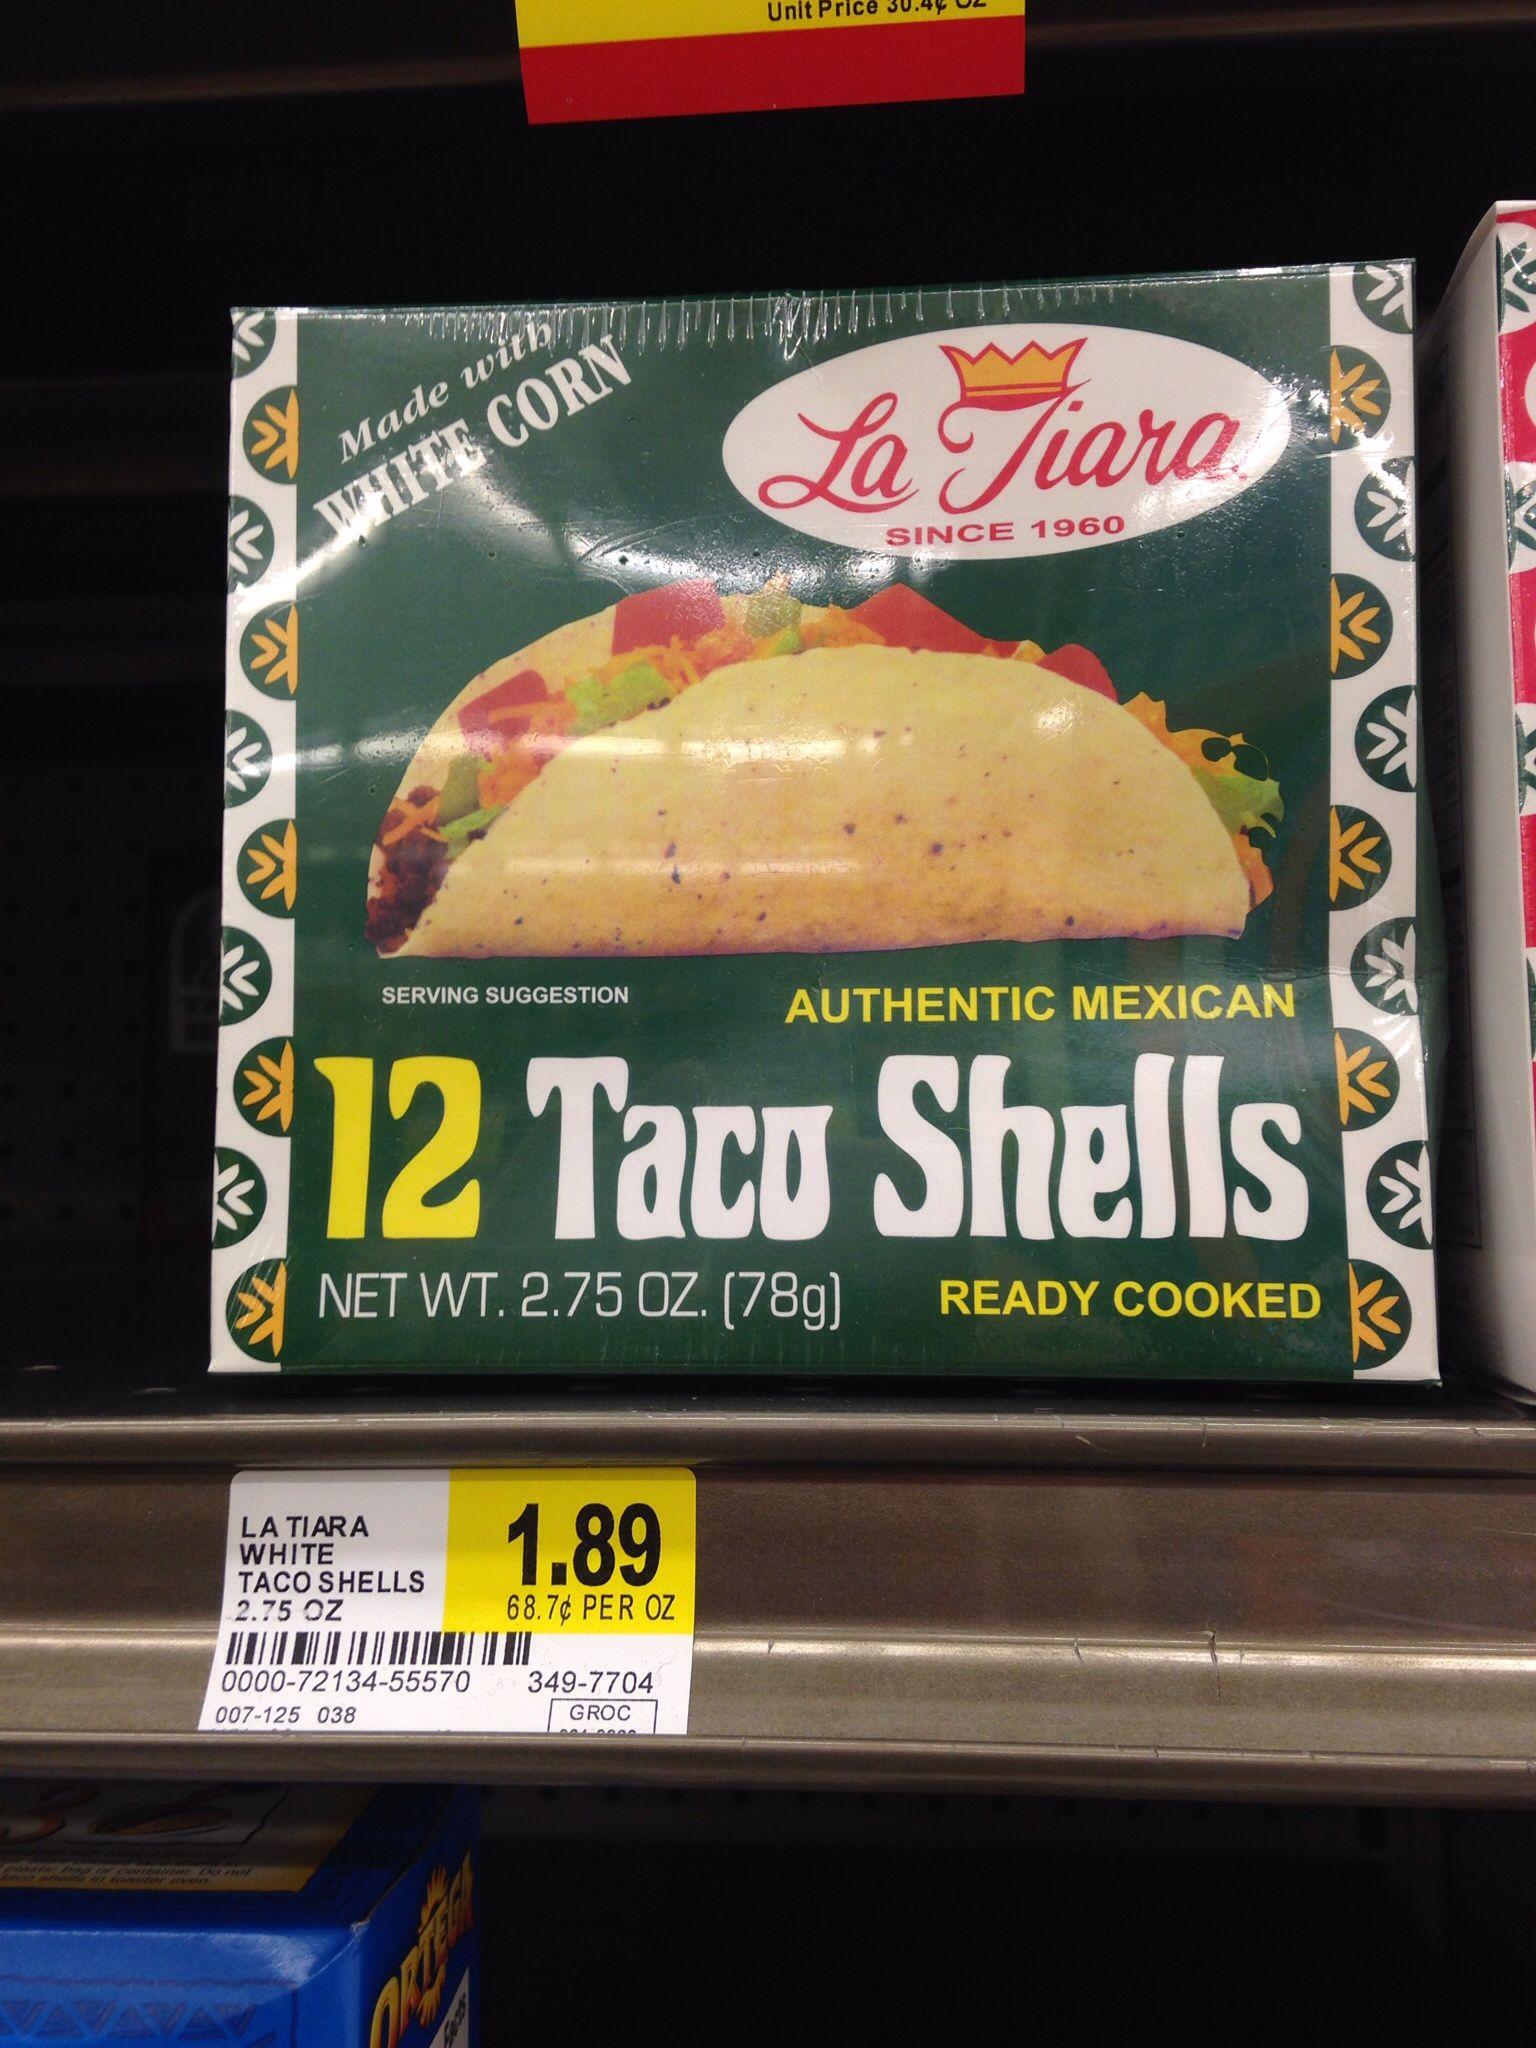 BEST taco shells ever! They won't crumble apart! #dandelionpudding